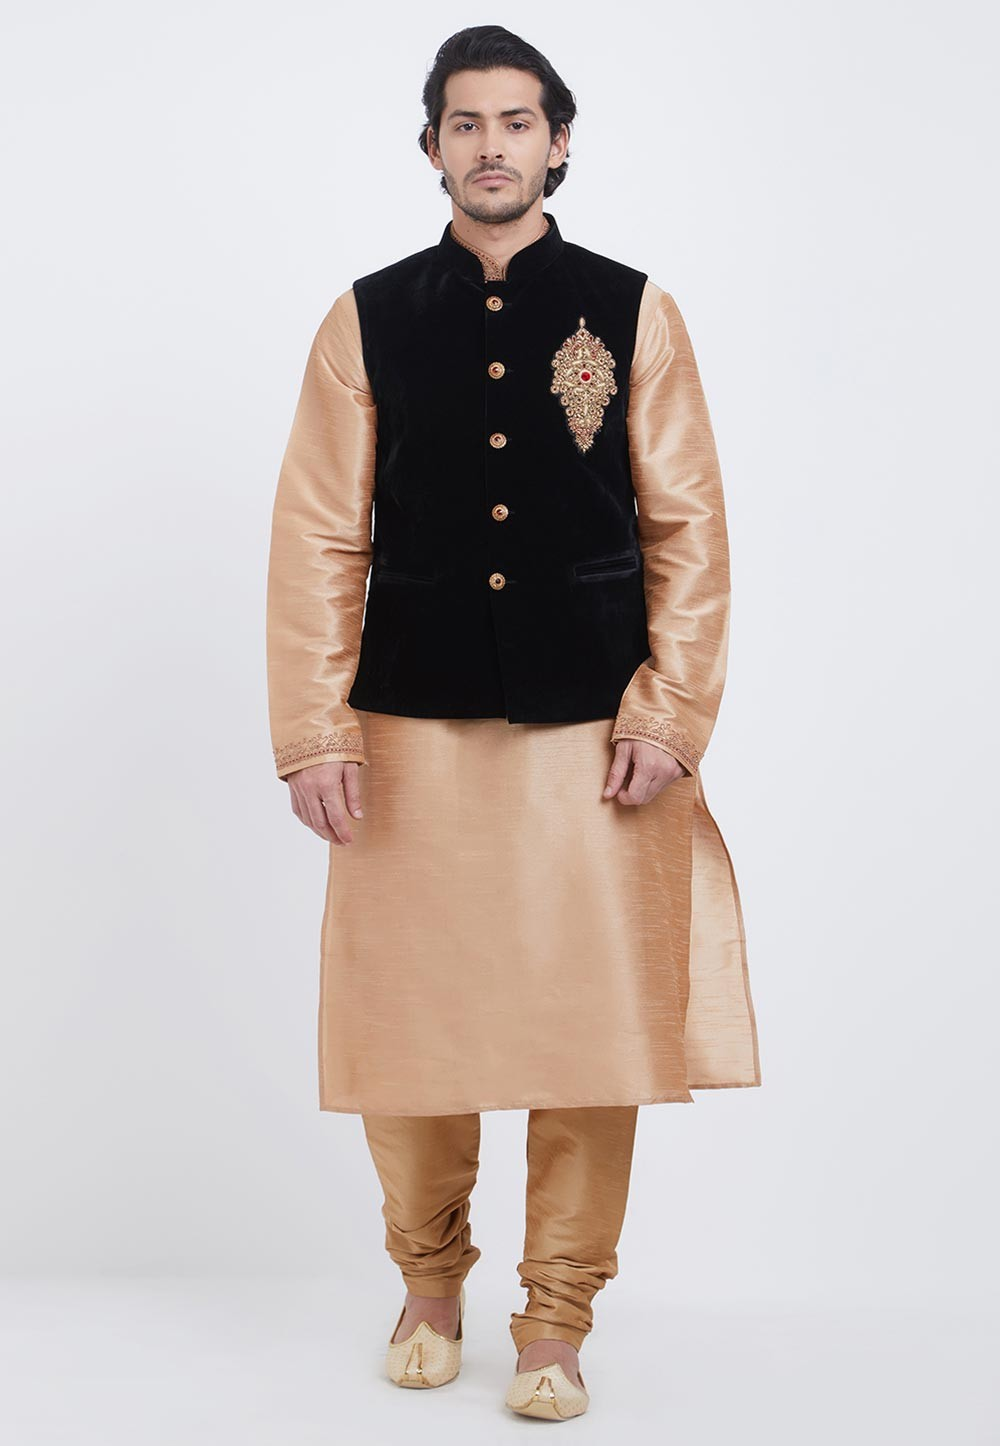 Golden,Black Colour Kurta Pajama Jacket.